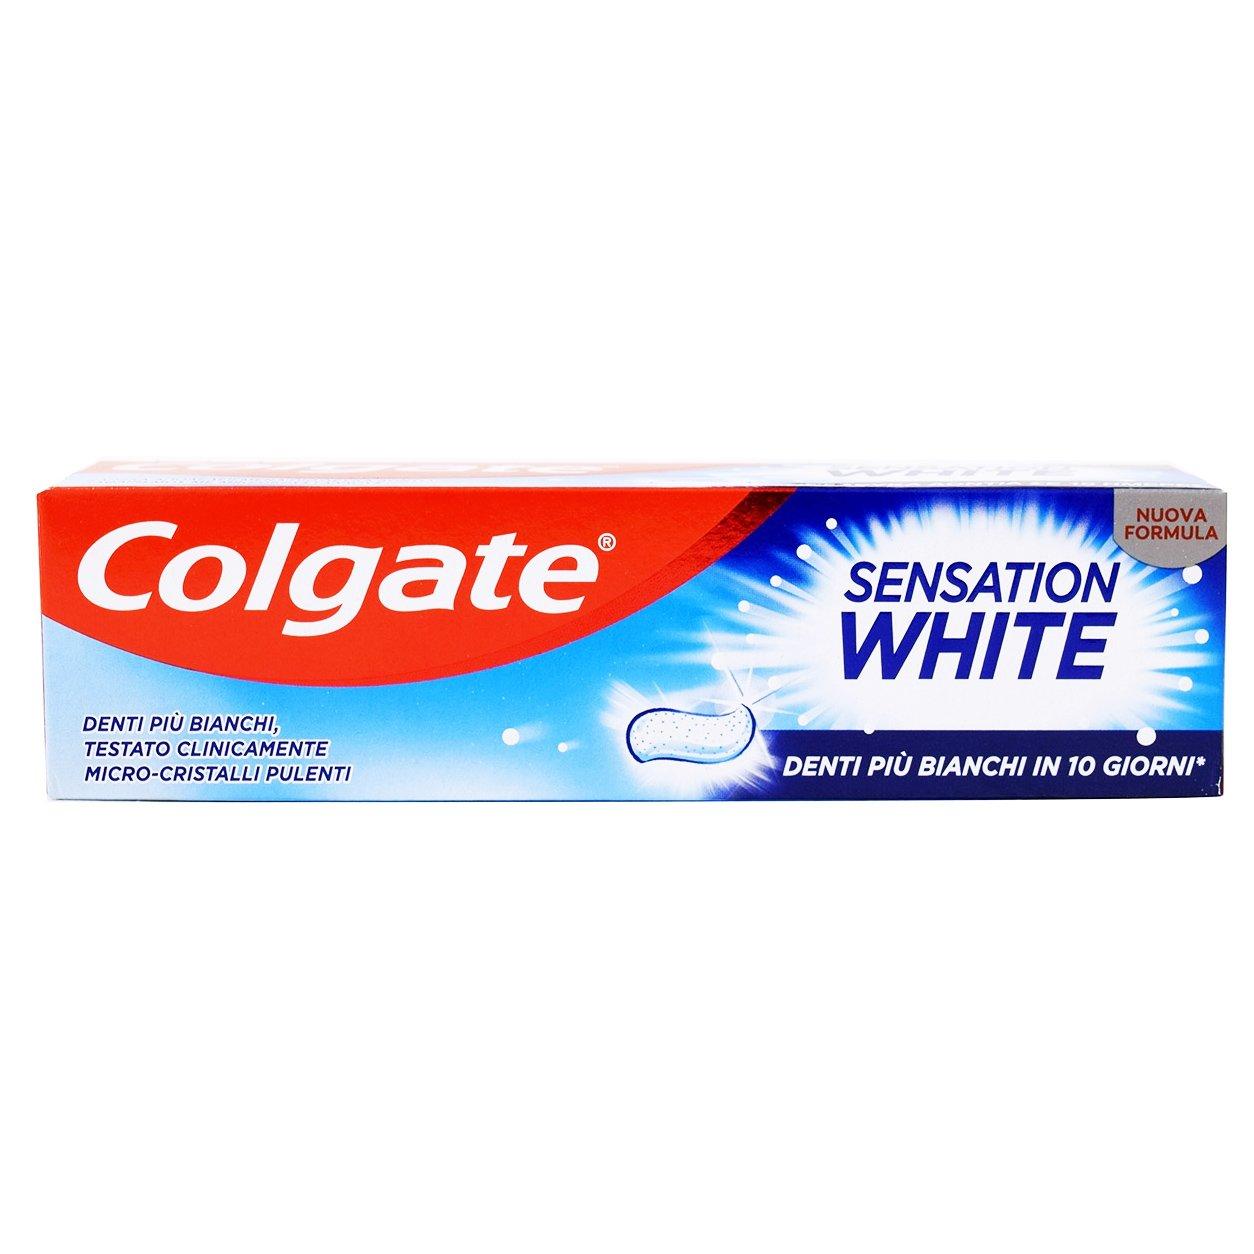 Colgate Sensation White 75ml,Οδοντόκρεμα για πιο Λευκά Δόντια σε 10 Ημέρες